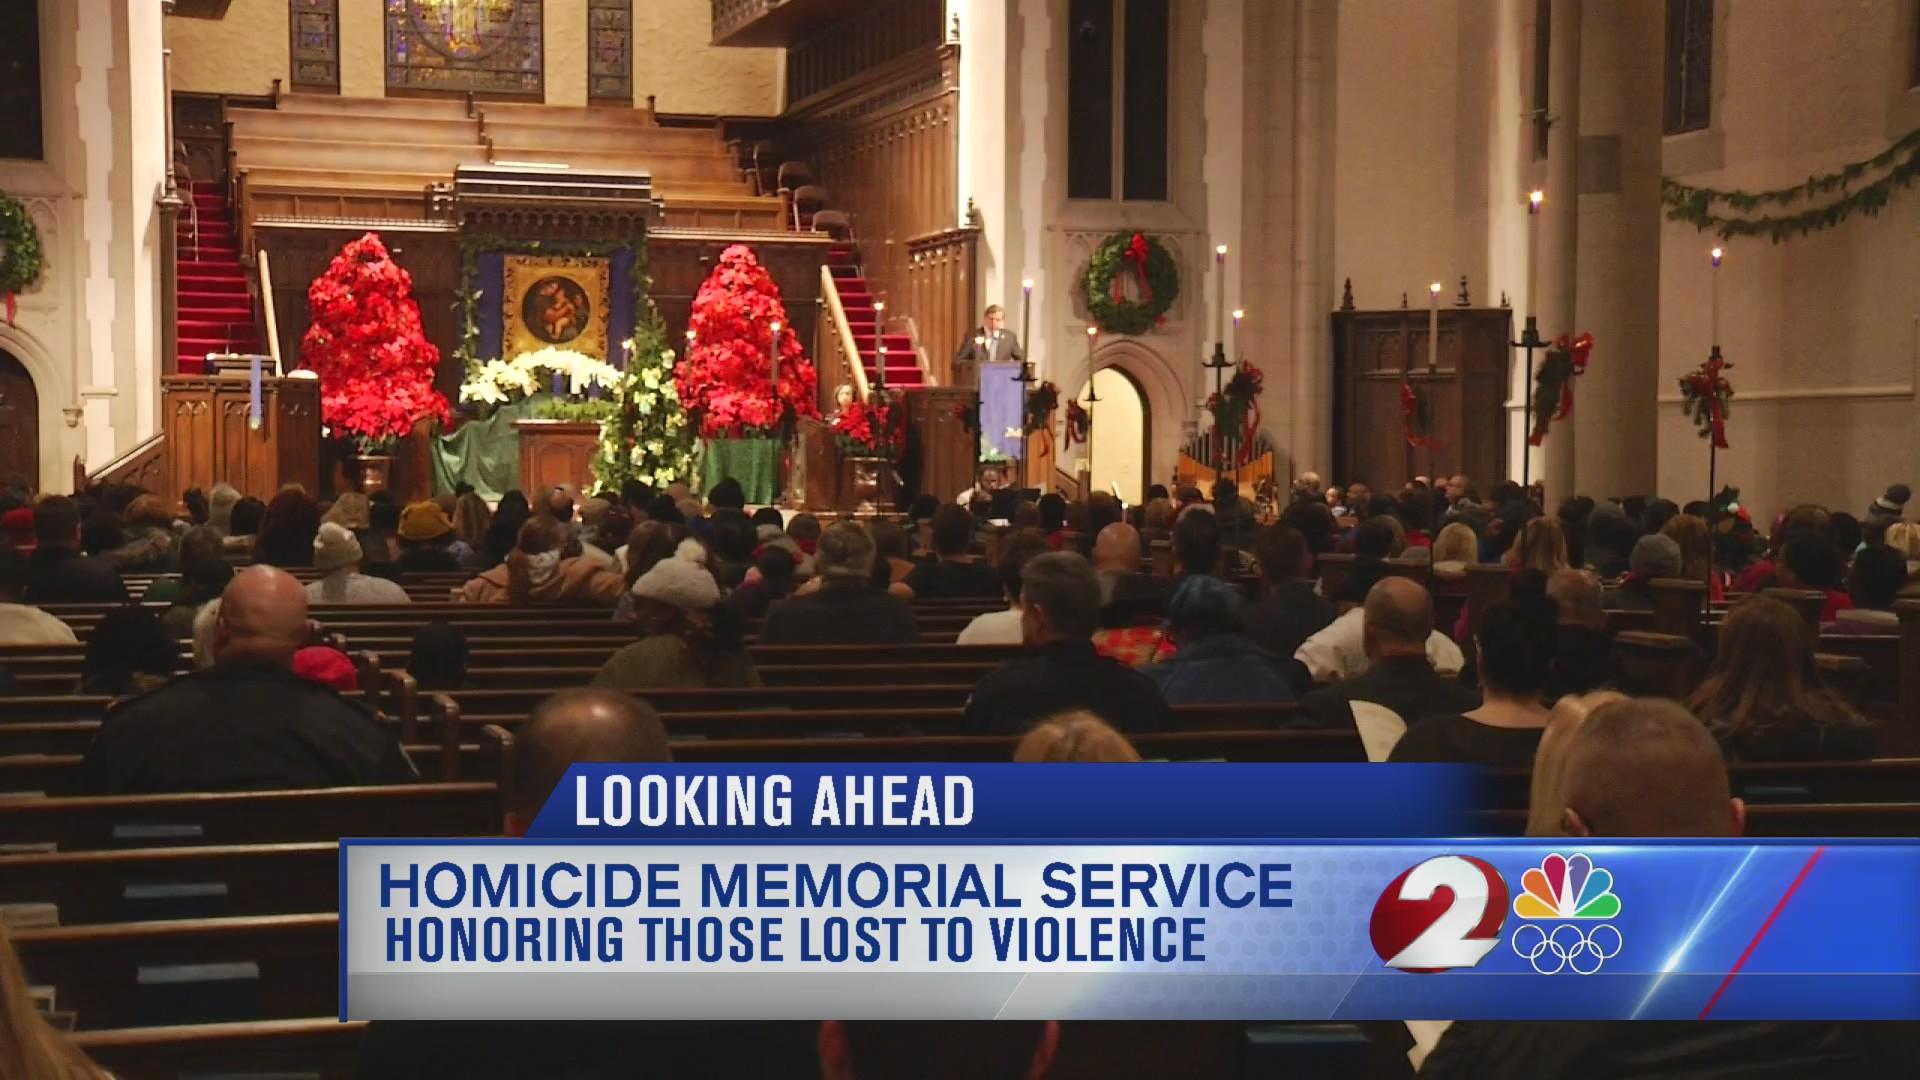 Homicide memorial service